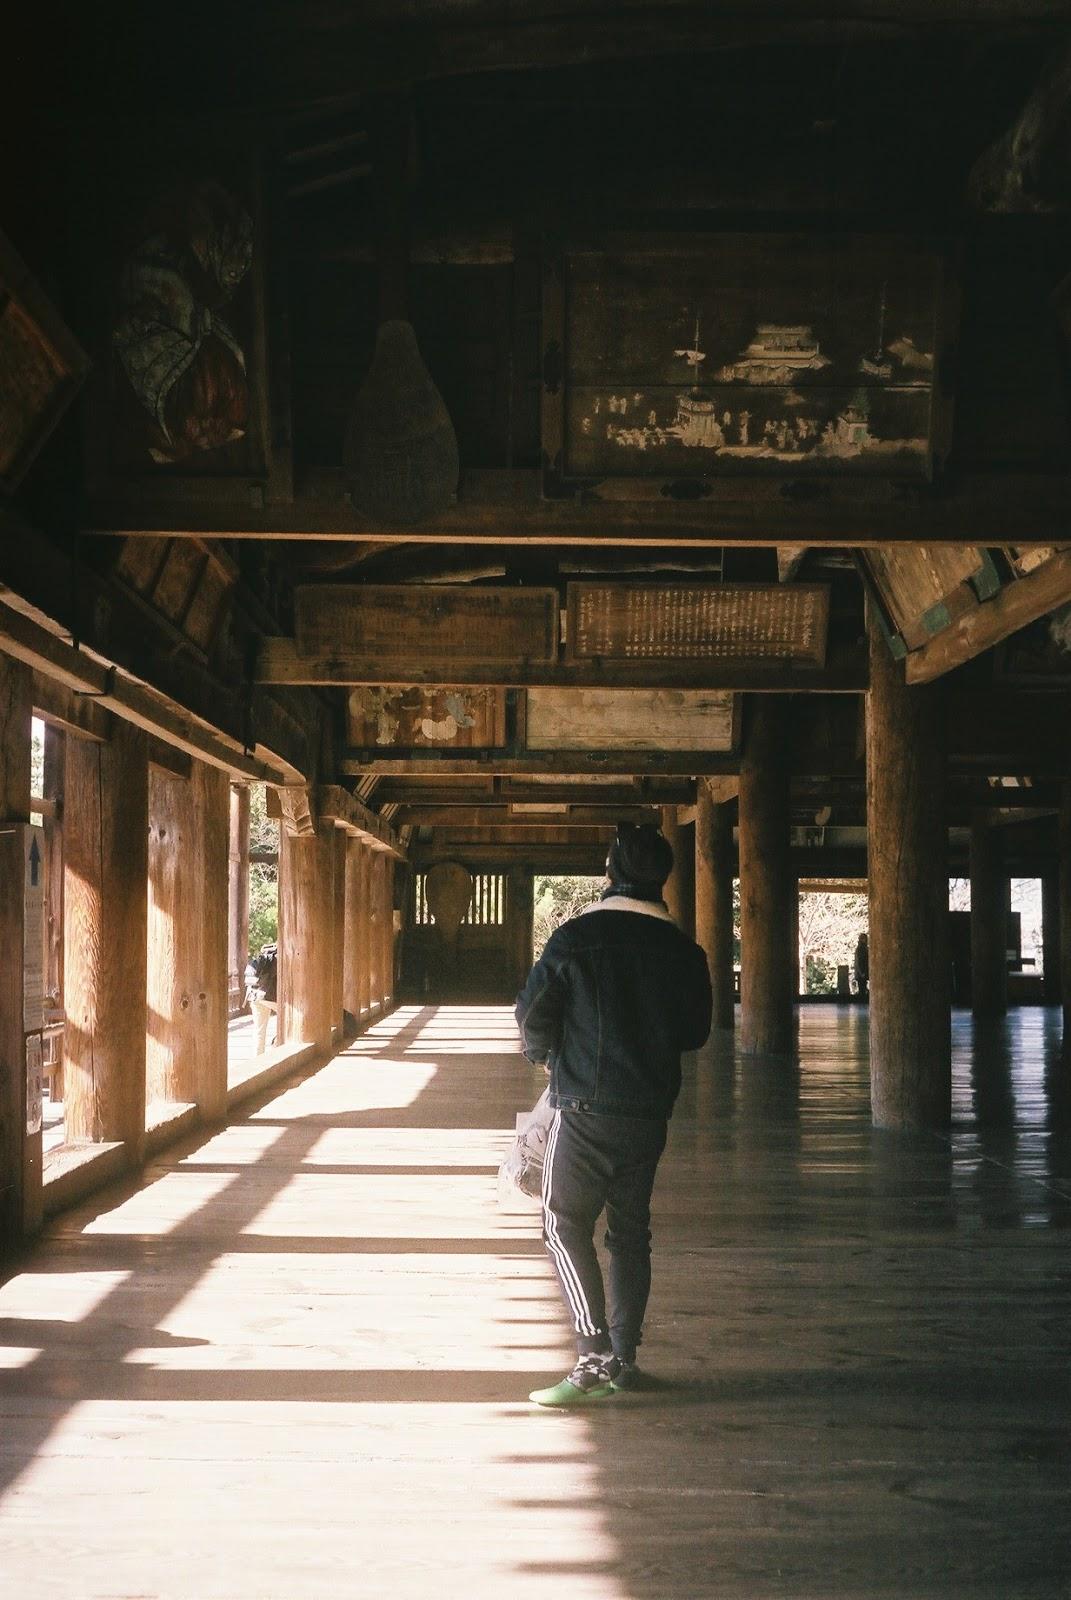 elashock, karen okuda, konichiwakaren, blog, travel, japan, hiroshima, osaka, fukuoka, film, film photography, 35mm, olympus trip 35, エラショック, 奥田カレン, ブログ, 写真, 旅行, 日本, 広島, 大阪, 福岡, フィルム, フィルムカメラ, カメラ, カメラ女子, オリンパス